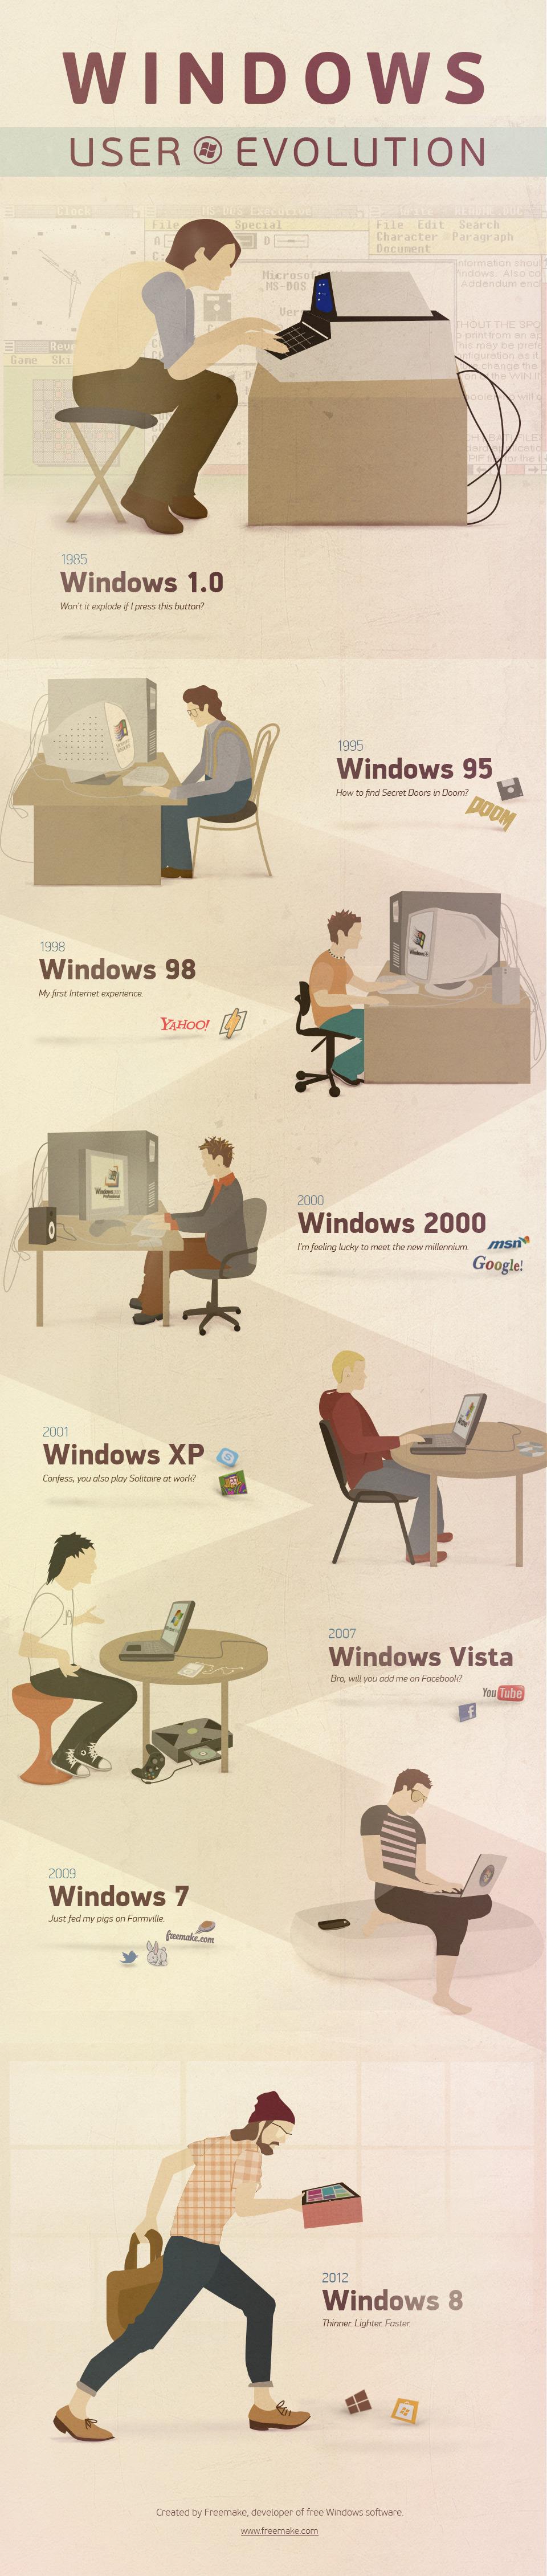 EVOLUTION-OF-WINDOWS